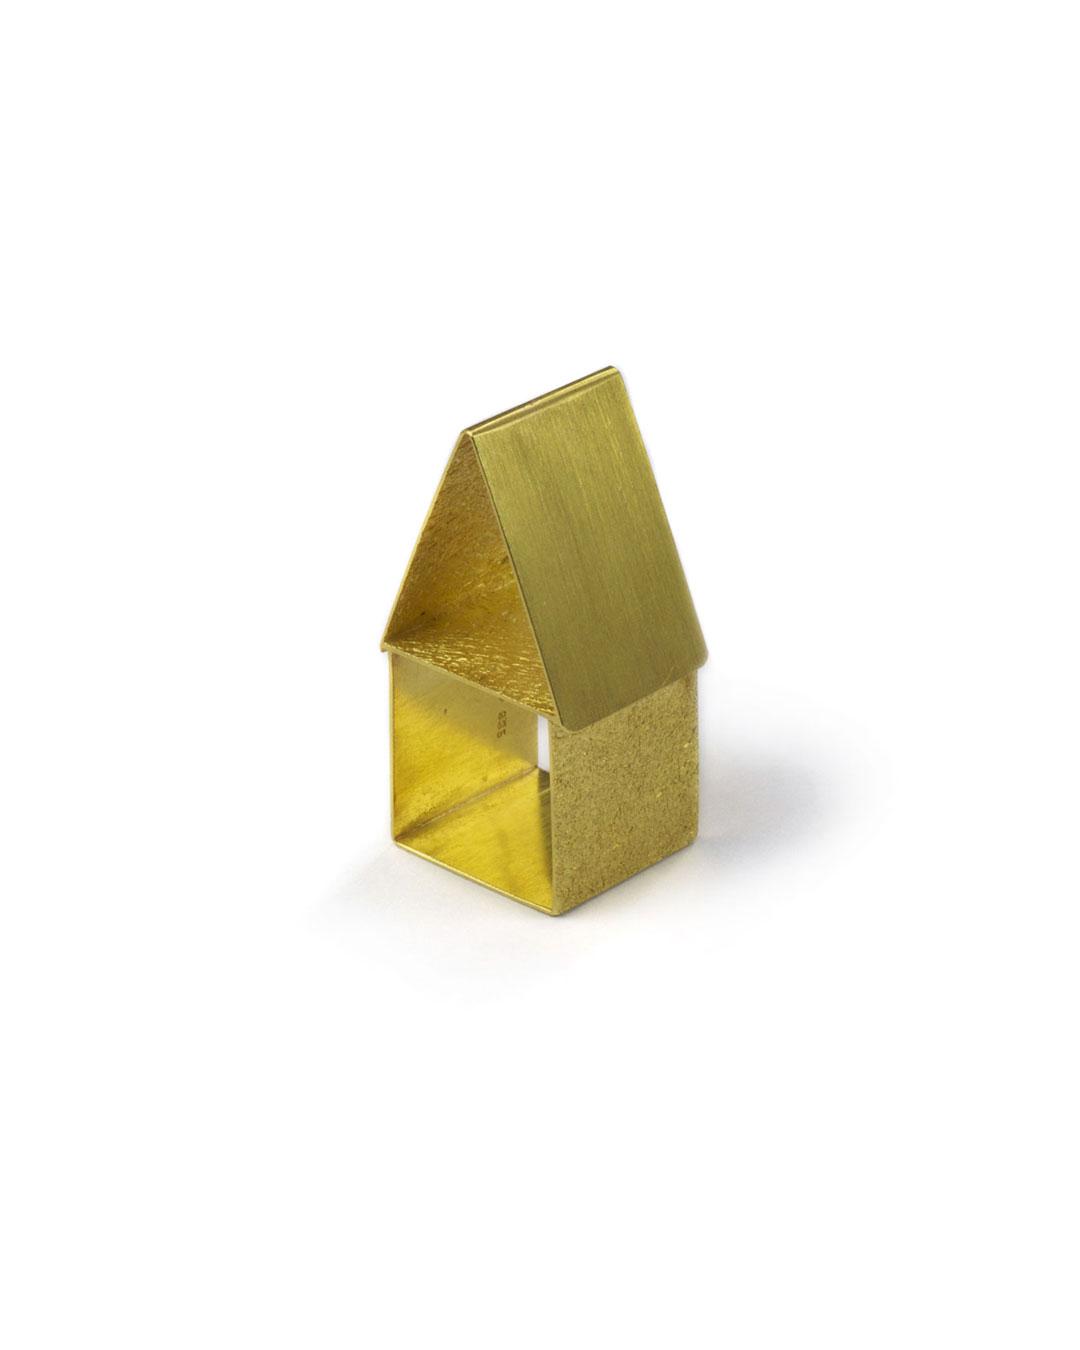 Okinari Kurokawa, untitled, 2004, ring; 20ct gold, 40 x 21 x 18 mm